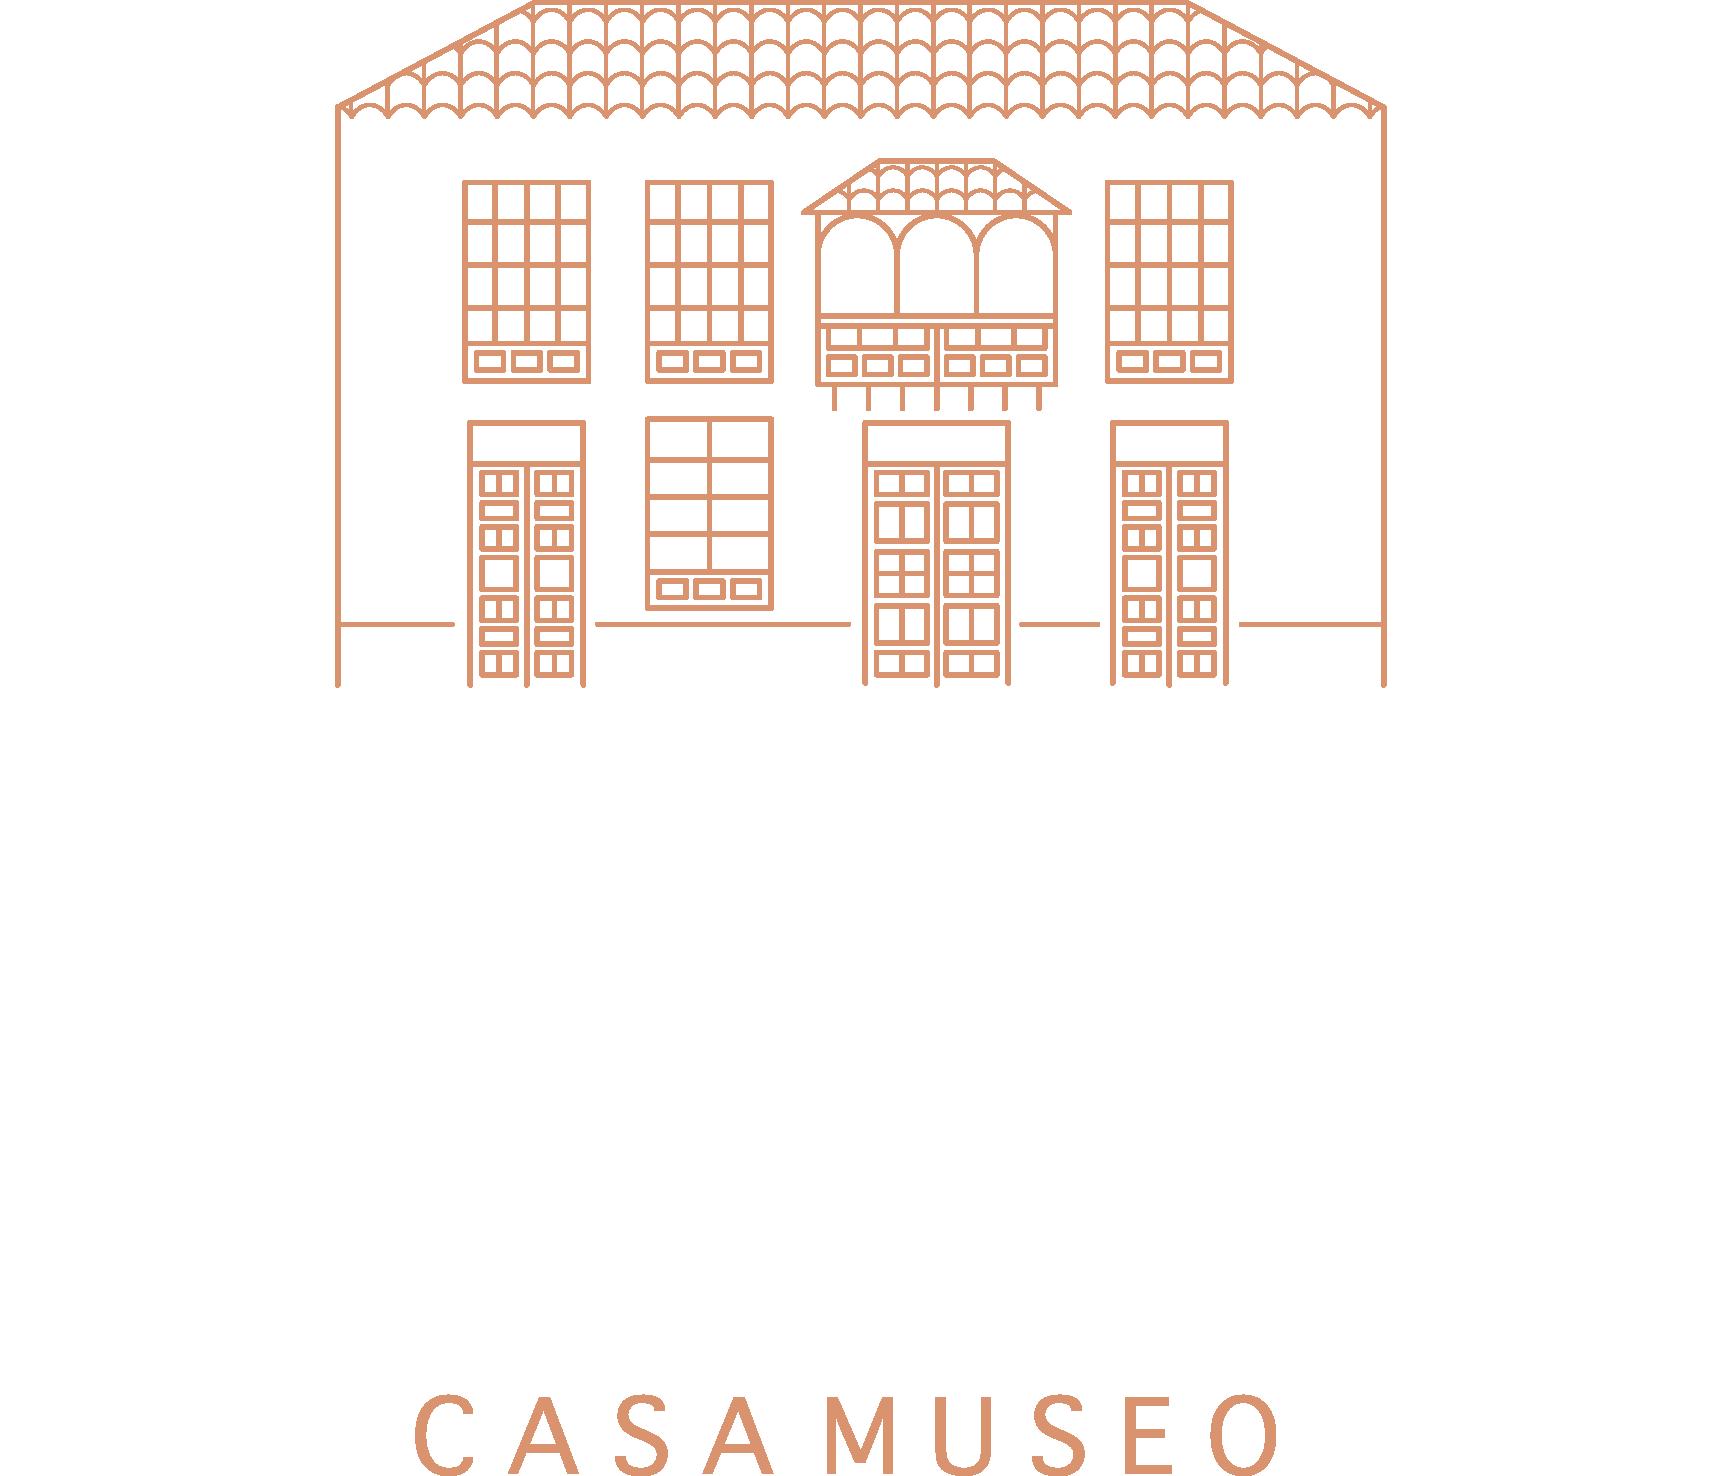 CAsa Museo Cayetano Gomez Felipe